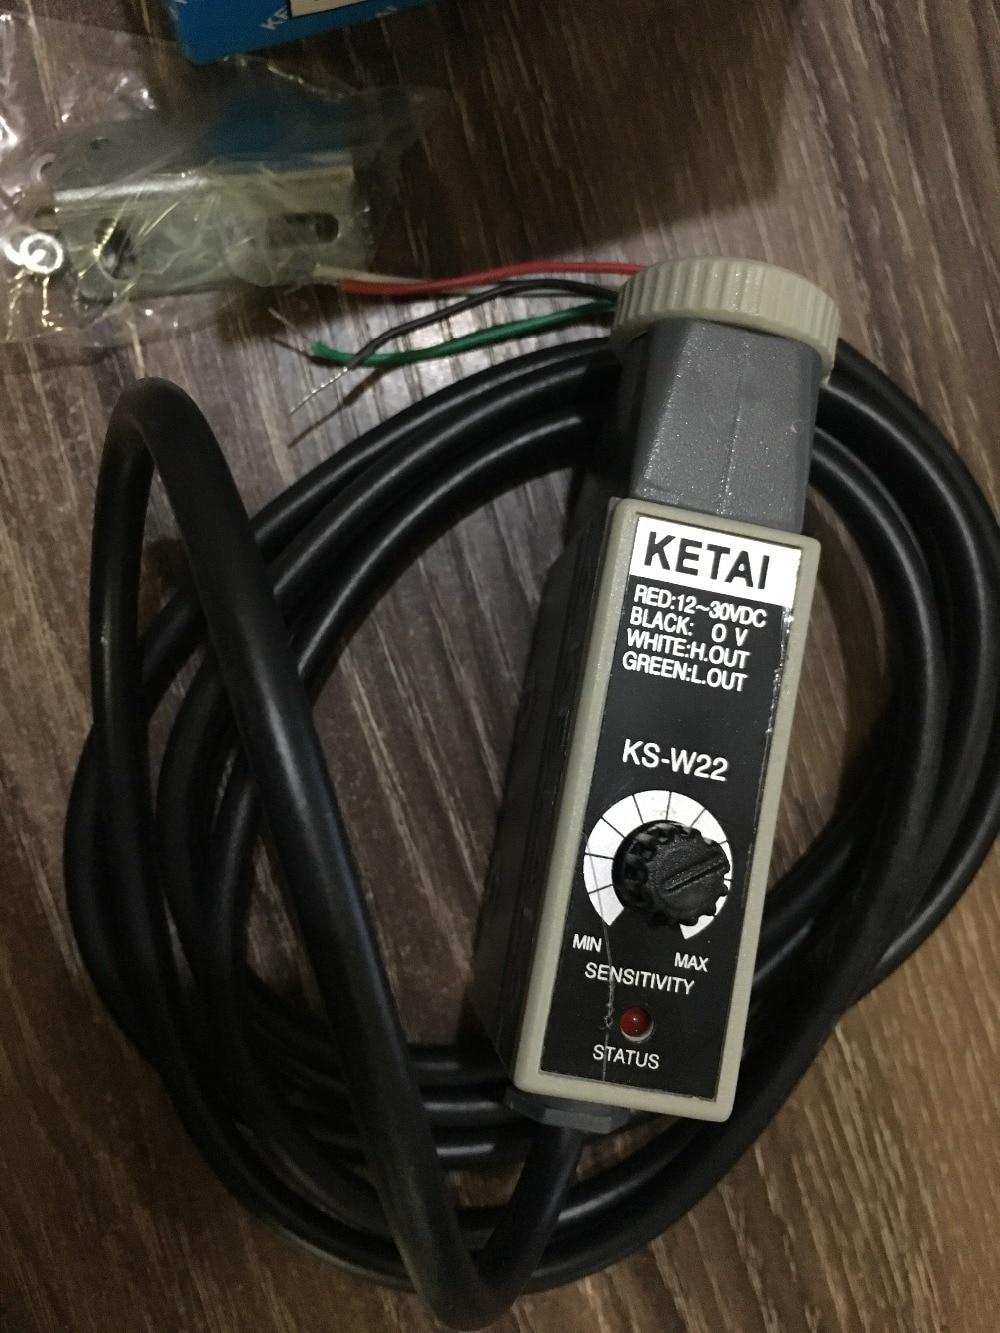 KS-W22 di colore KETAI sensori fotoelettrici, interruttore fotoelettrico di colore Fare elettromeccanicoKS-W22 di colore KETAI sensori fotoelettrici, interruttore fotoelettrico di colore Fare elettromeccanico